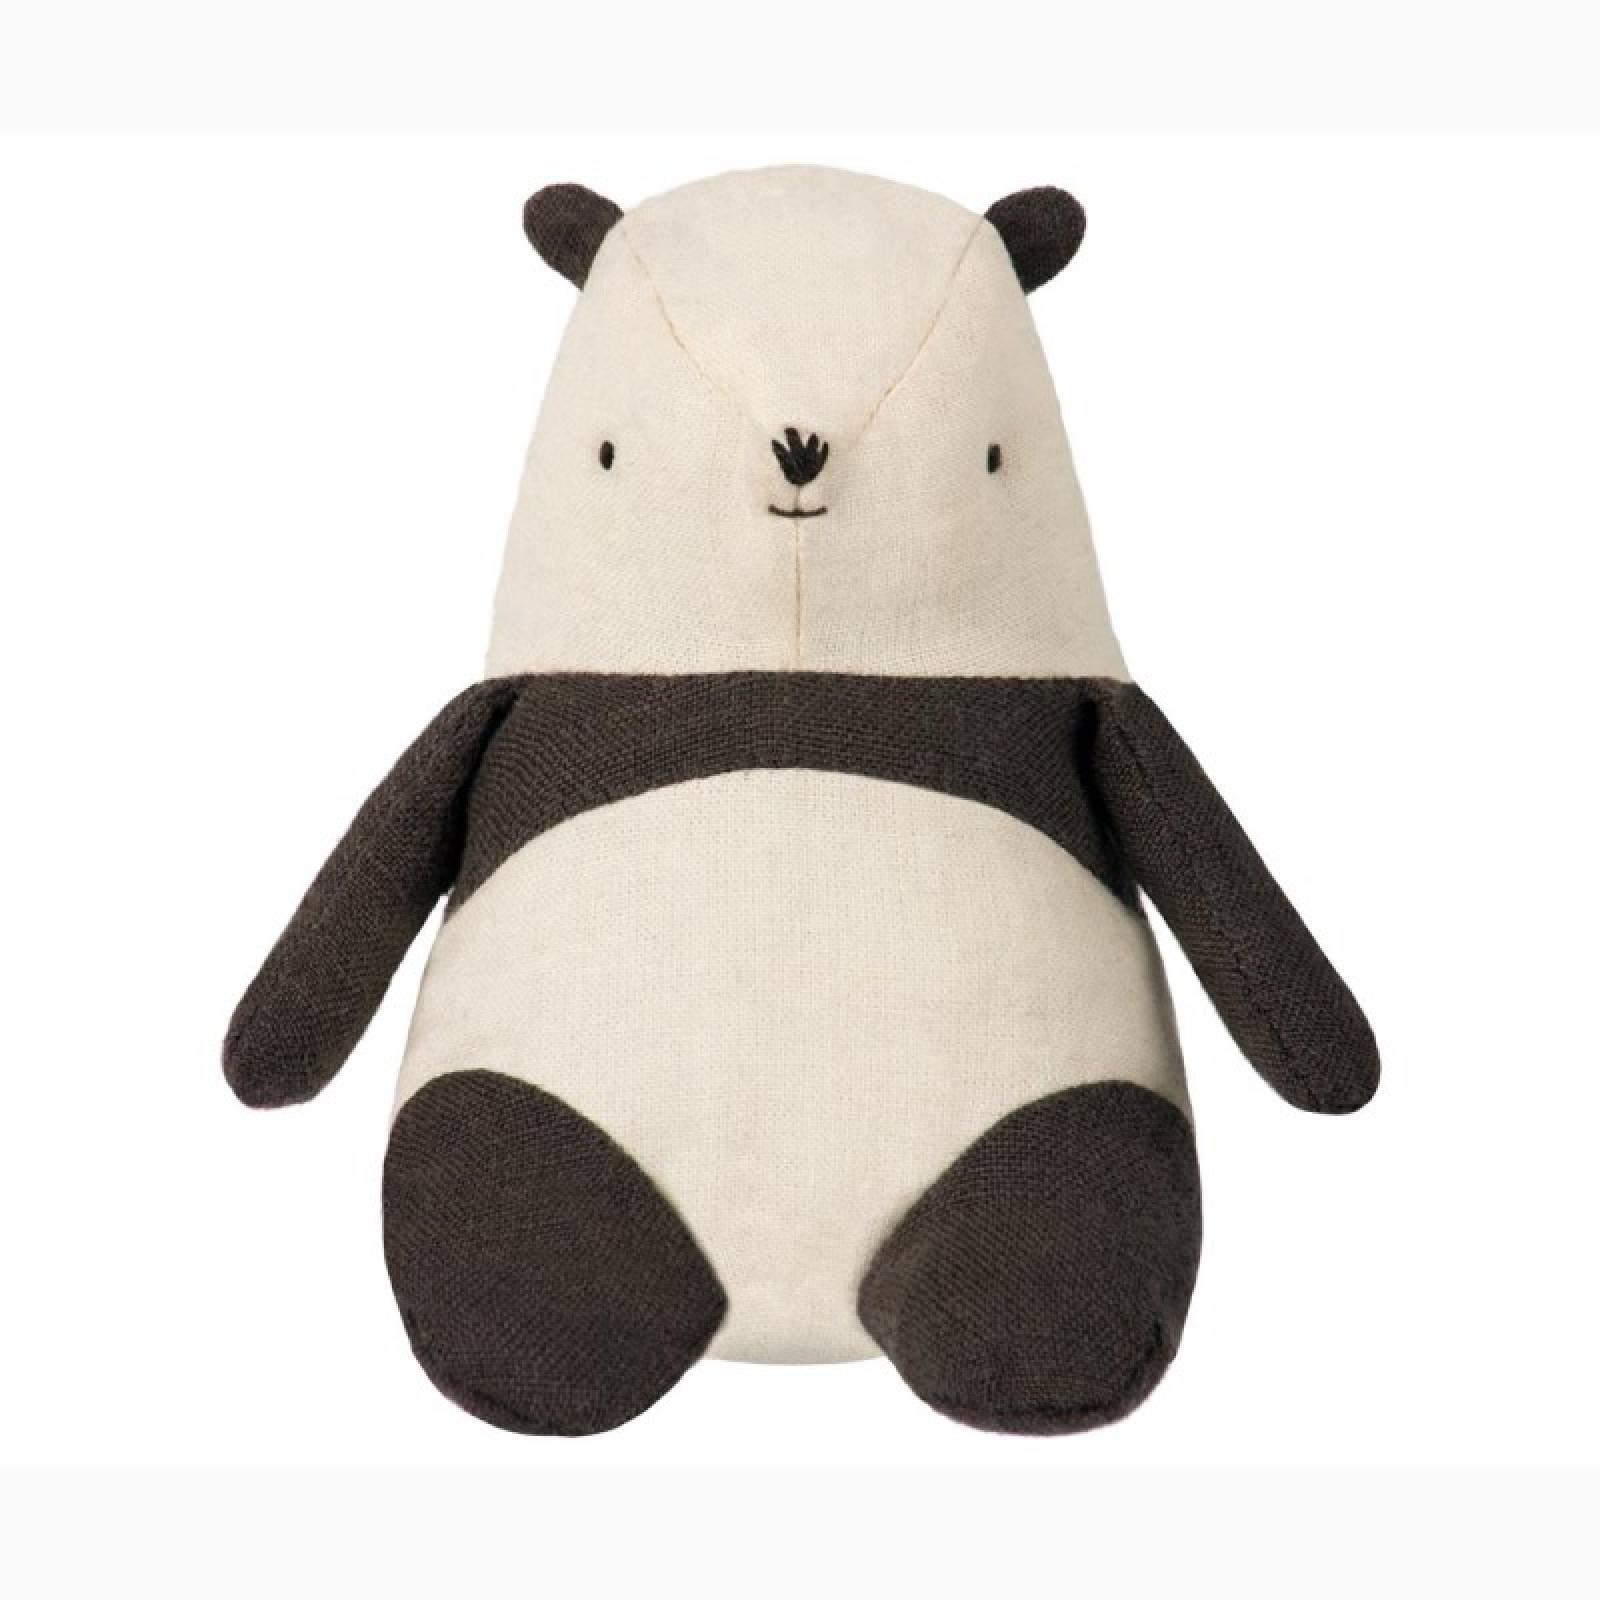 Mini Panda Soft Toy Noah's Friends By Maileg 0+